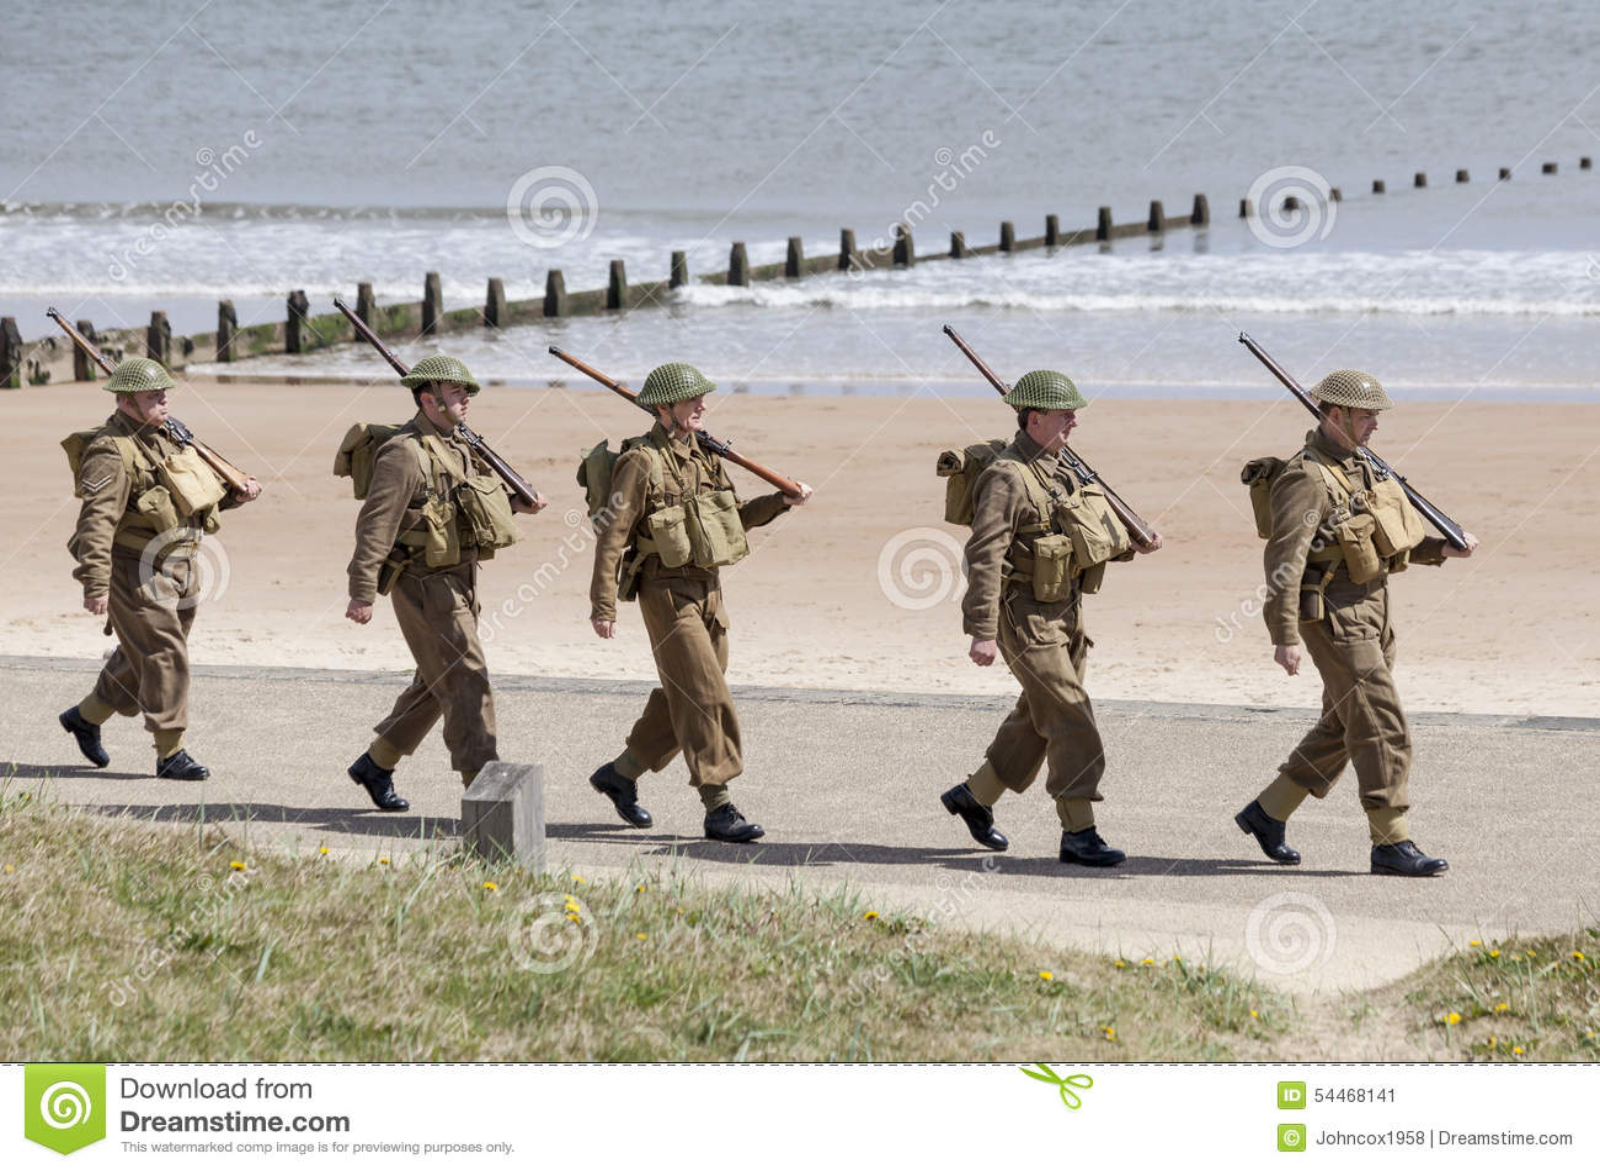 Reenactment Of World War 2 Battle  Blyth, Northumberland